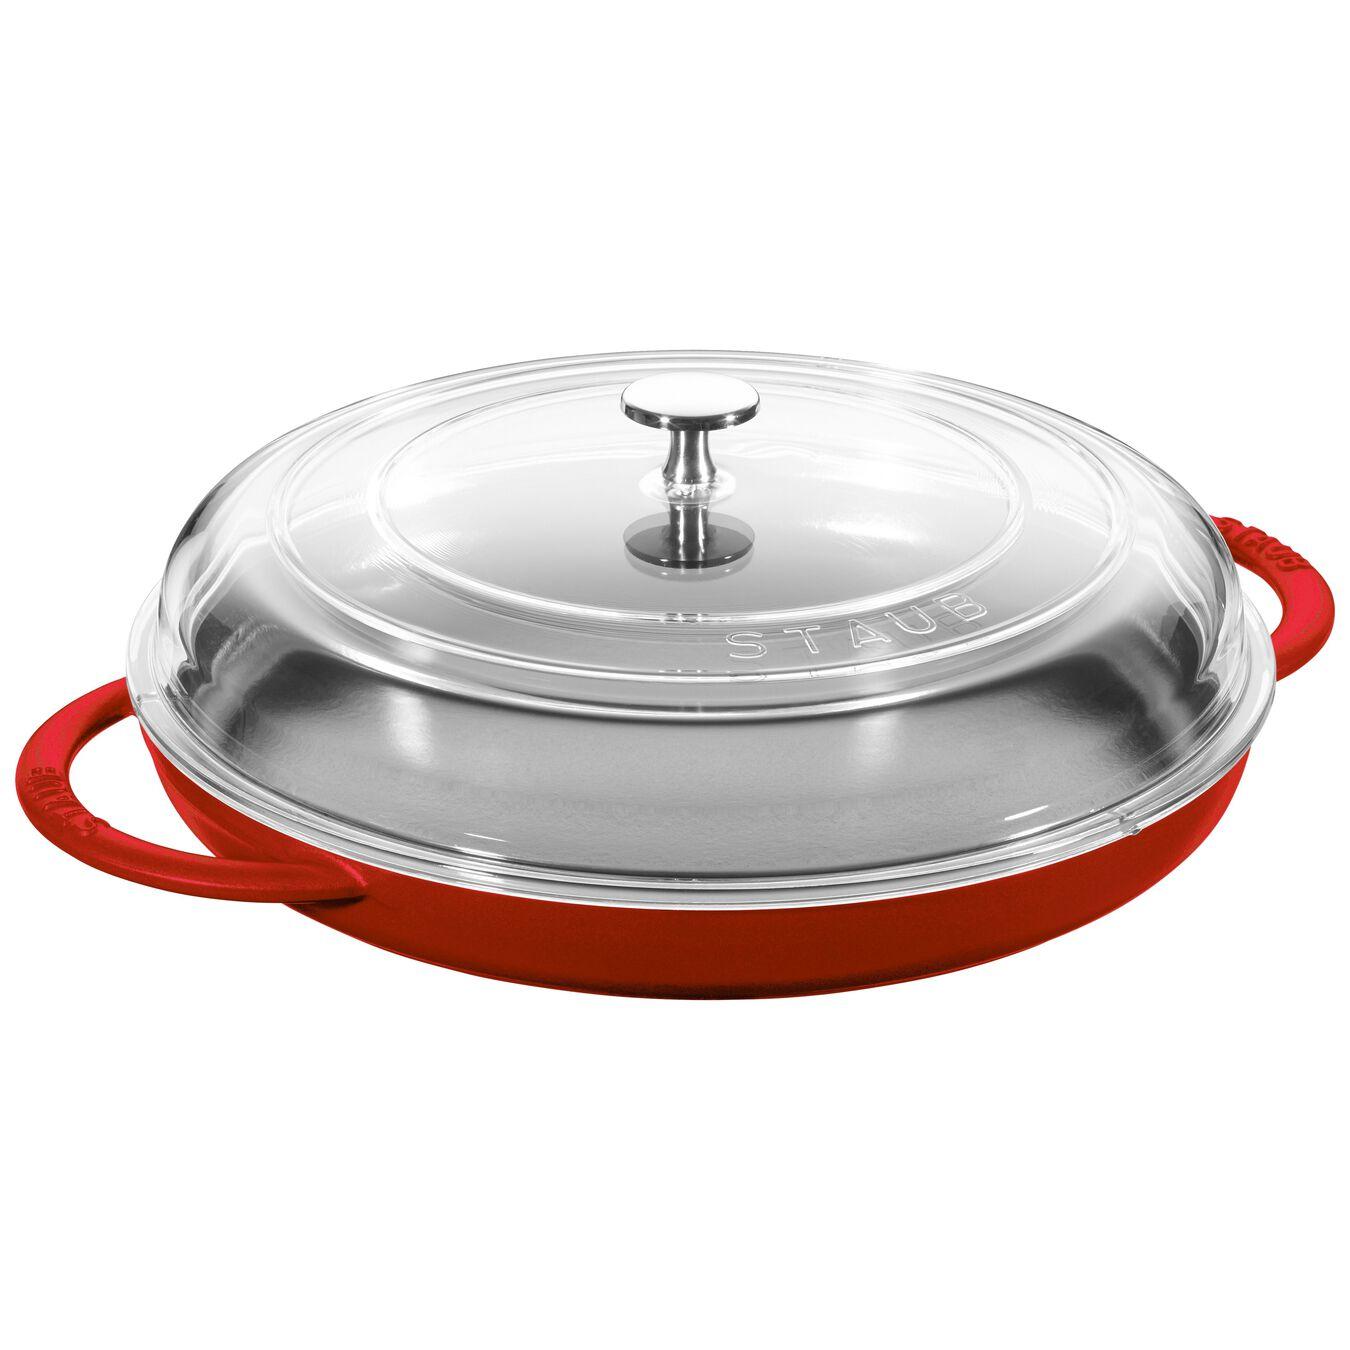 12-inch Round Steam Griddle - Cherry,,large 1